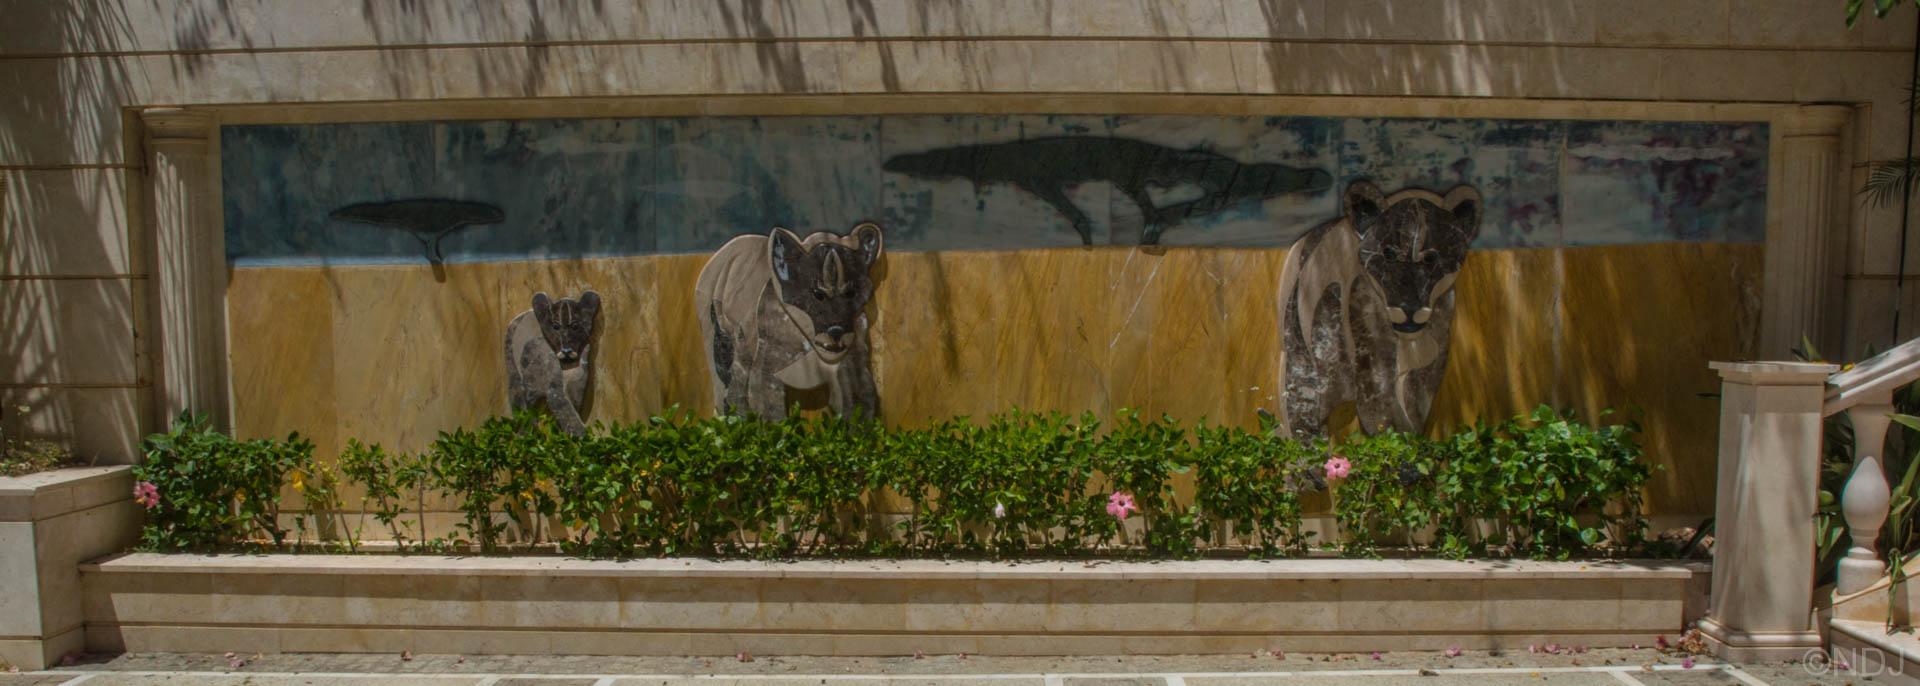 Mural diseño leones